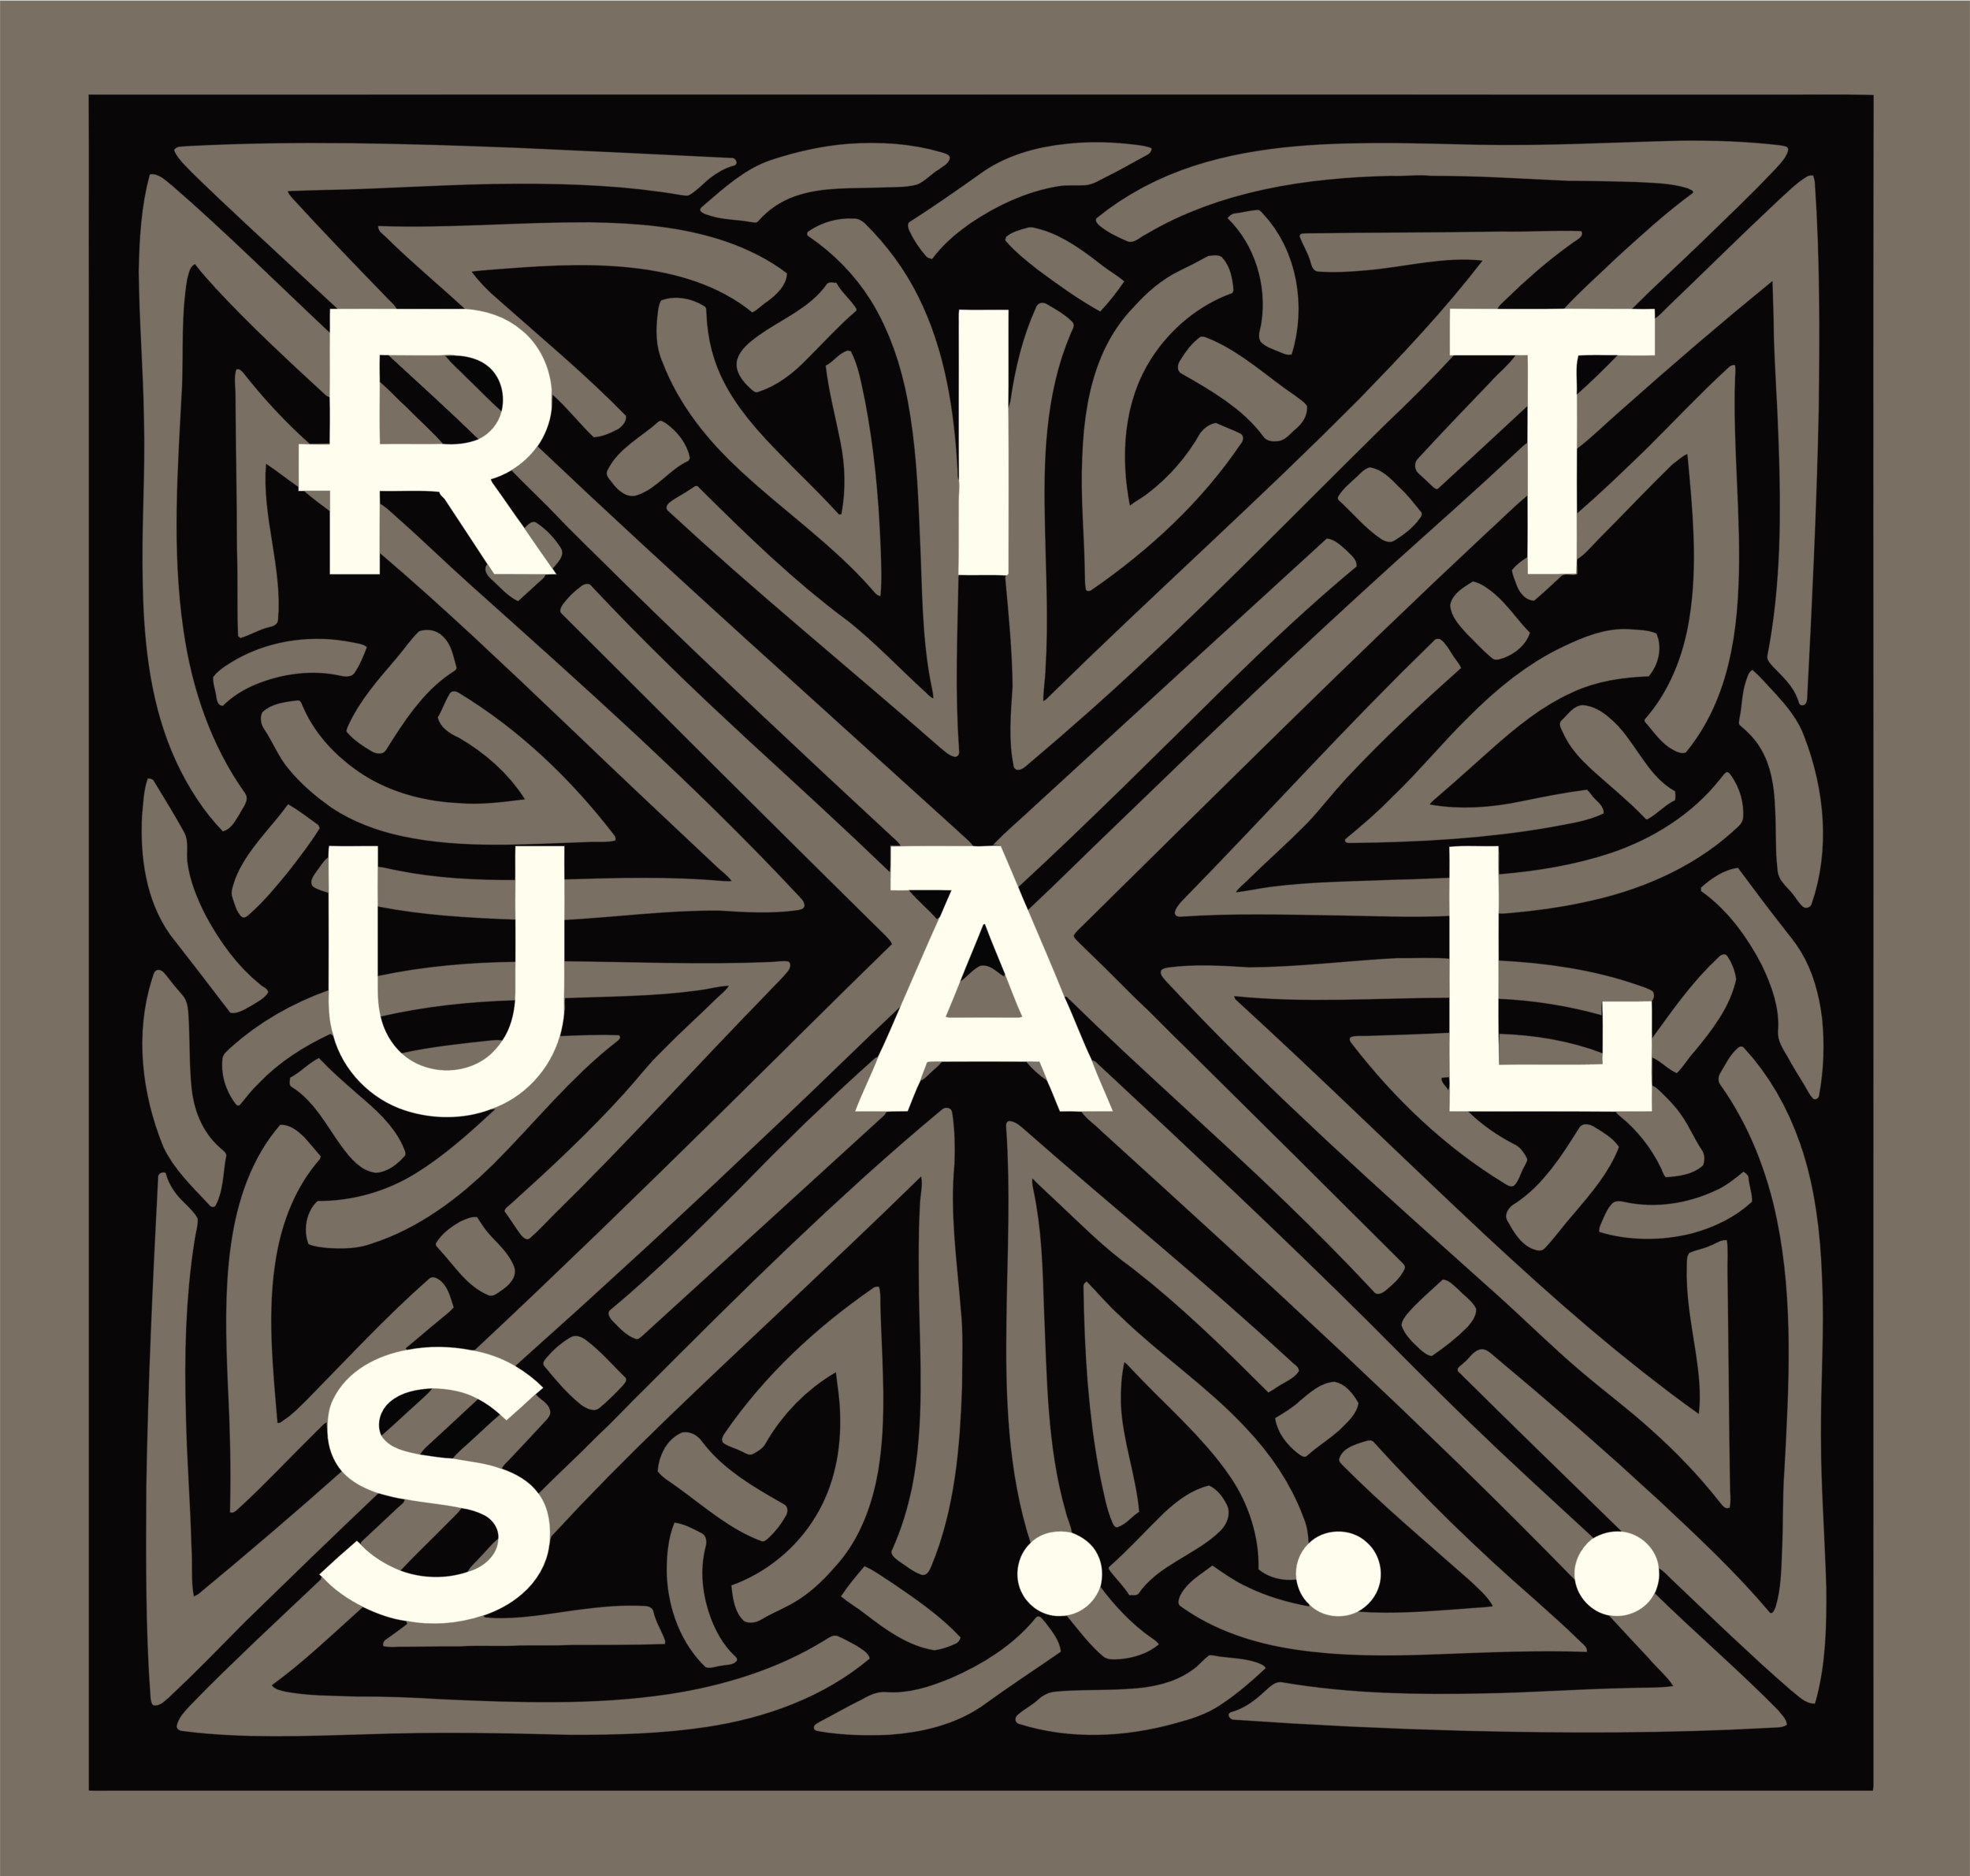 Rituals_Cosmetics_logo.png